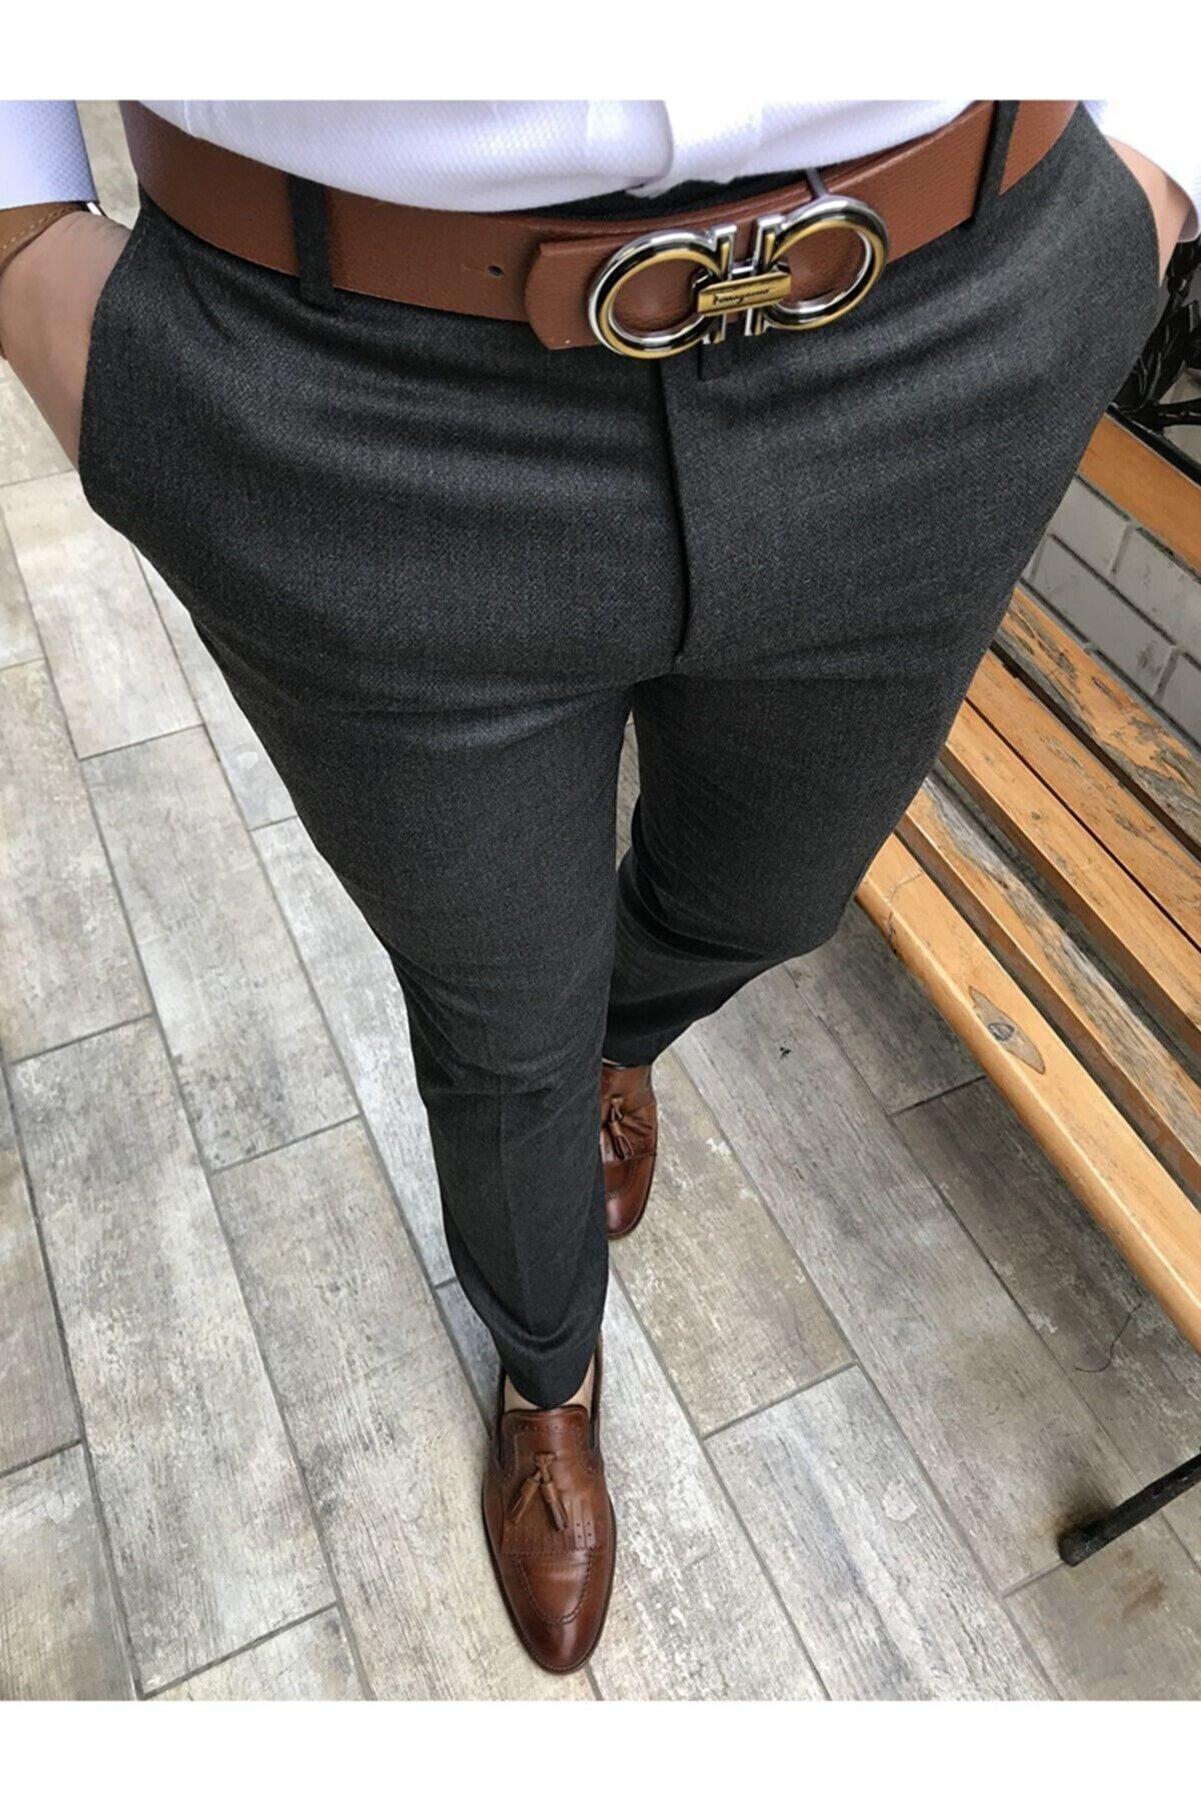 TerziAdemAltun Italyan Kesim Slim Fit Antrasit Kumaş Pantolon T3485